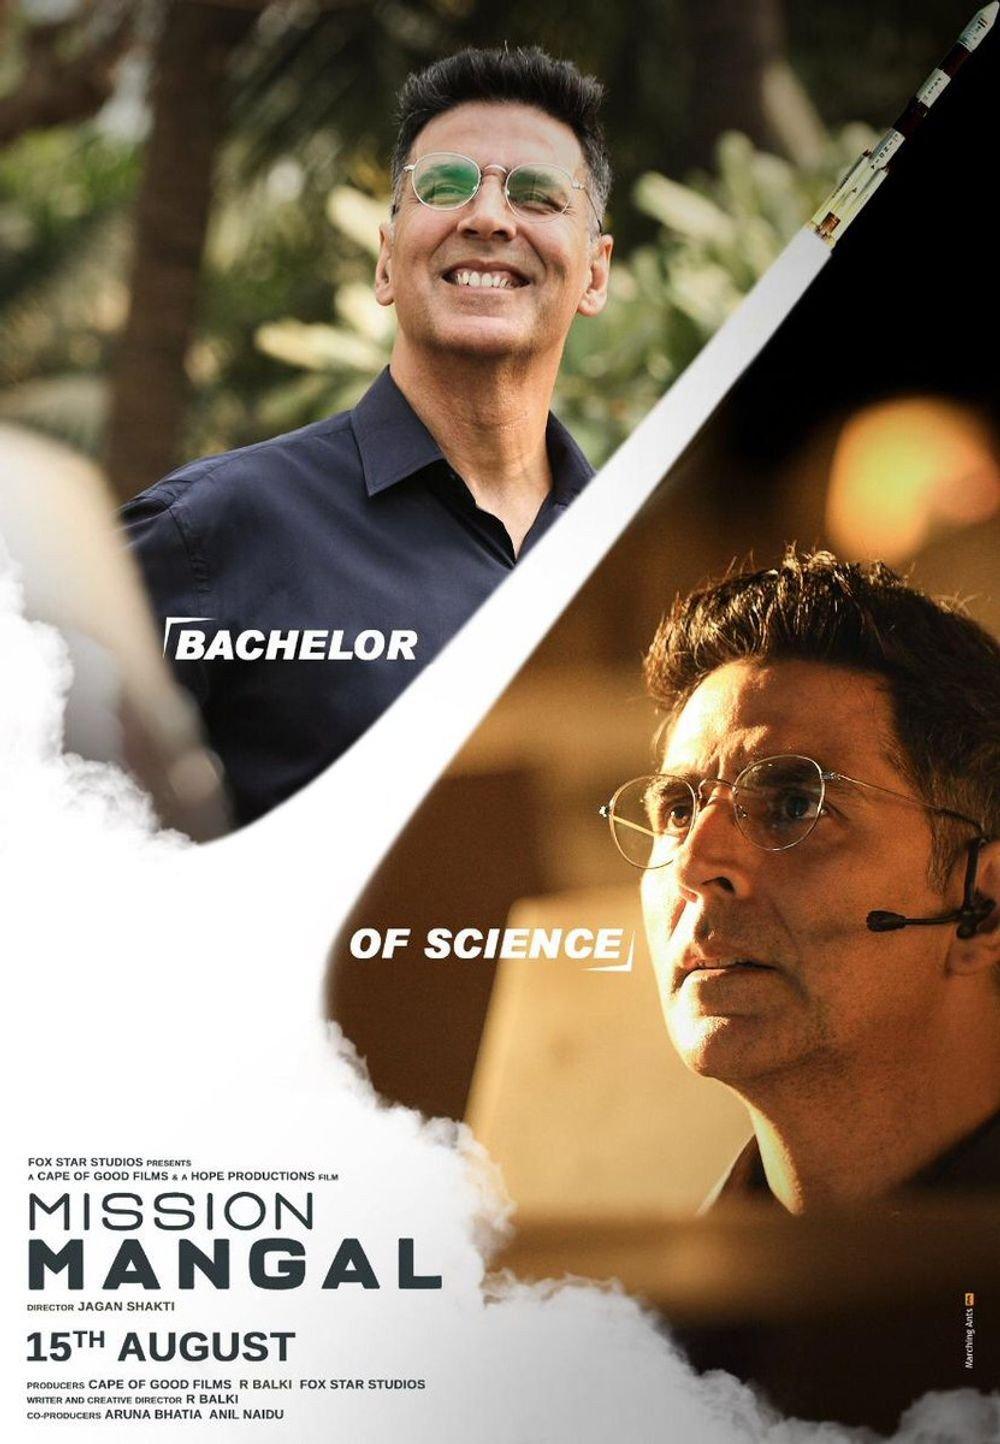 4-<p>Mission Mangal</p>